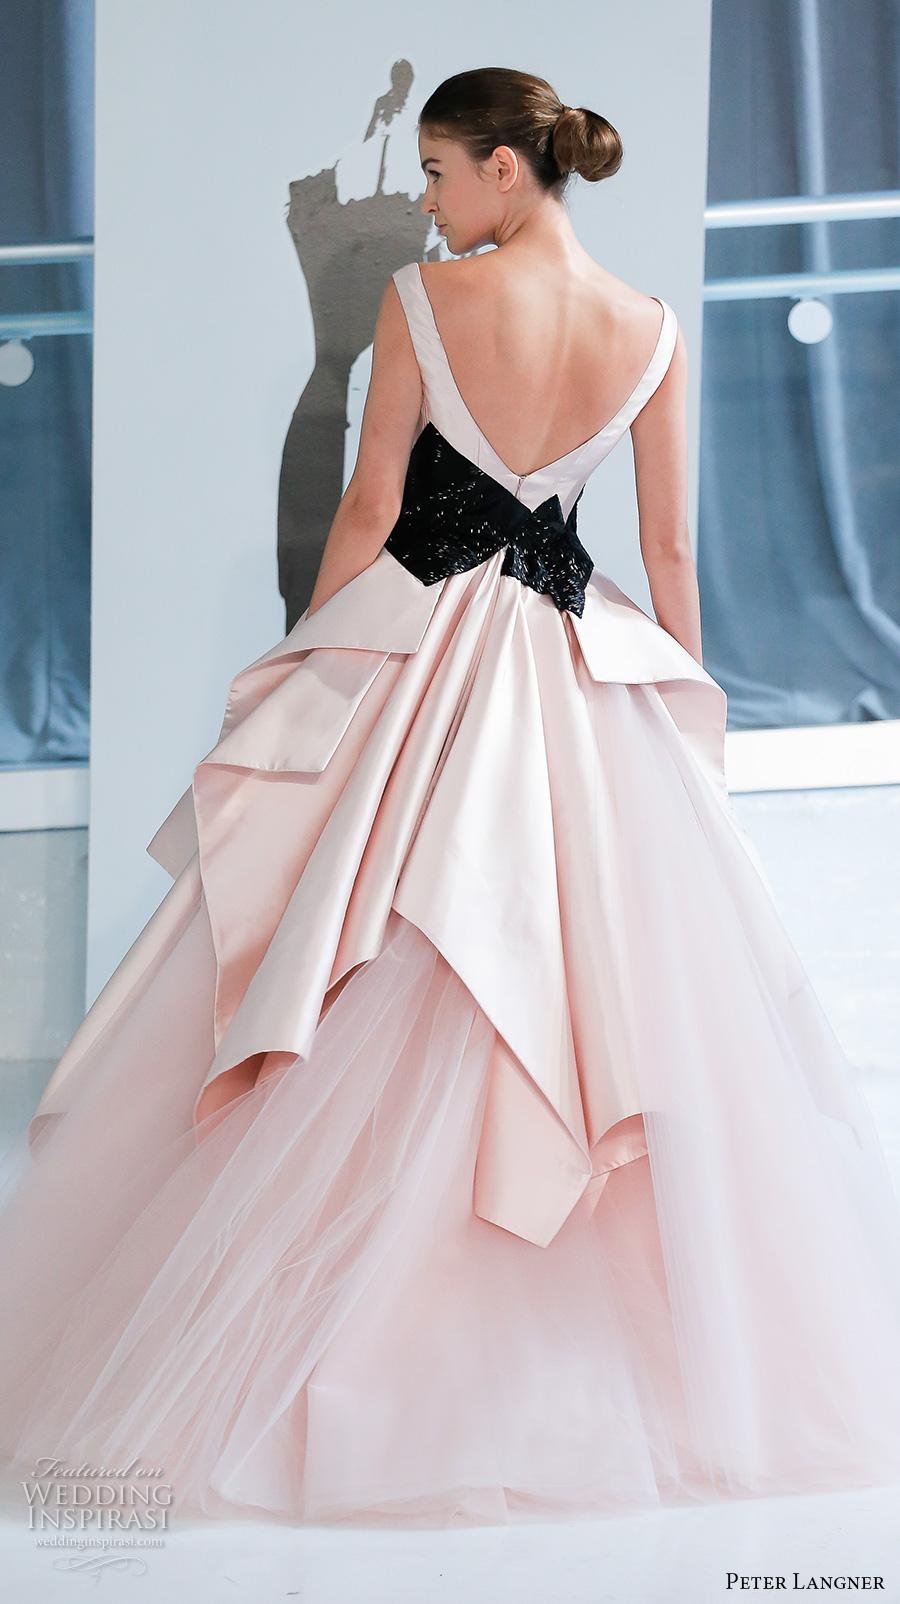 peter-langner-spring-2018-bridal-sleeveless-v-neck-black-accent-simple-pink-princess-ball-gown-wedding-dress-open-v-back-chapel-train-01-bv.jpg